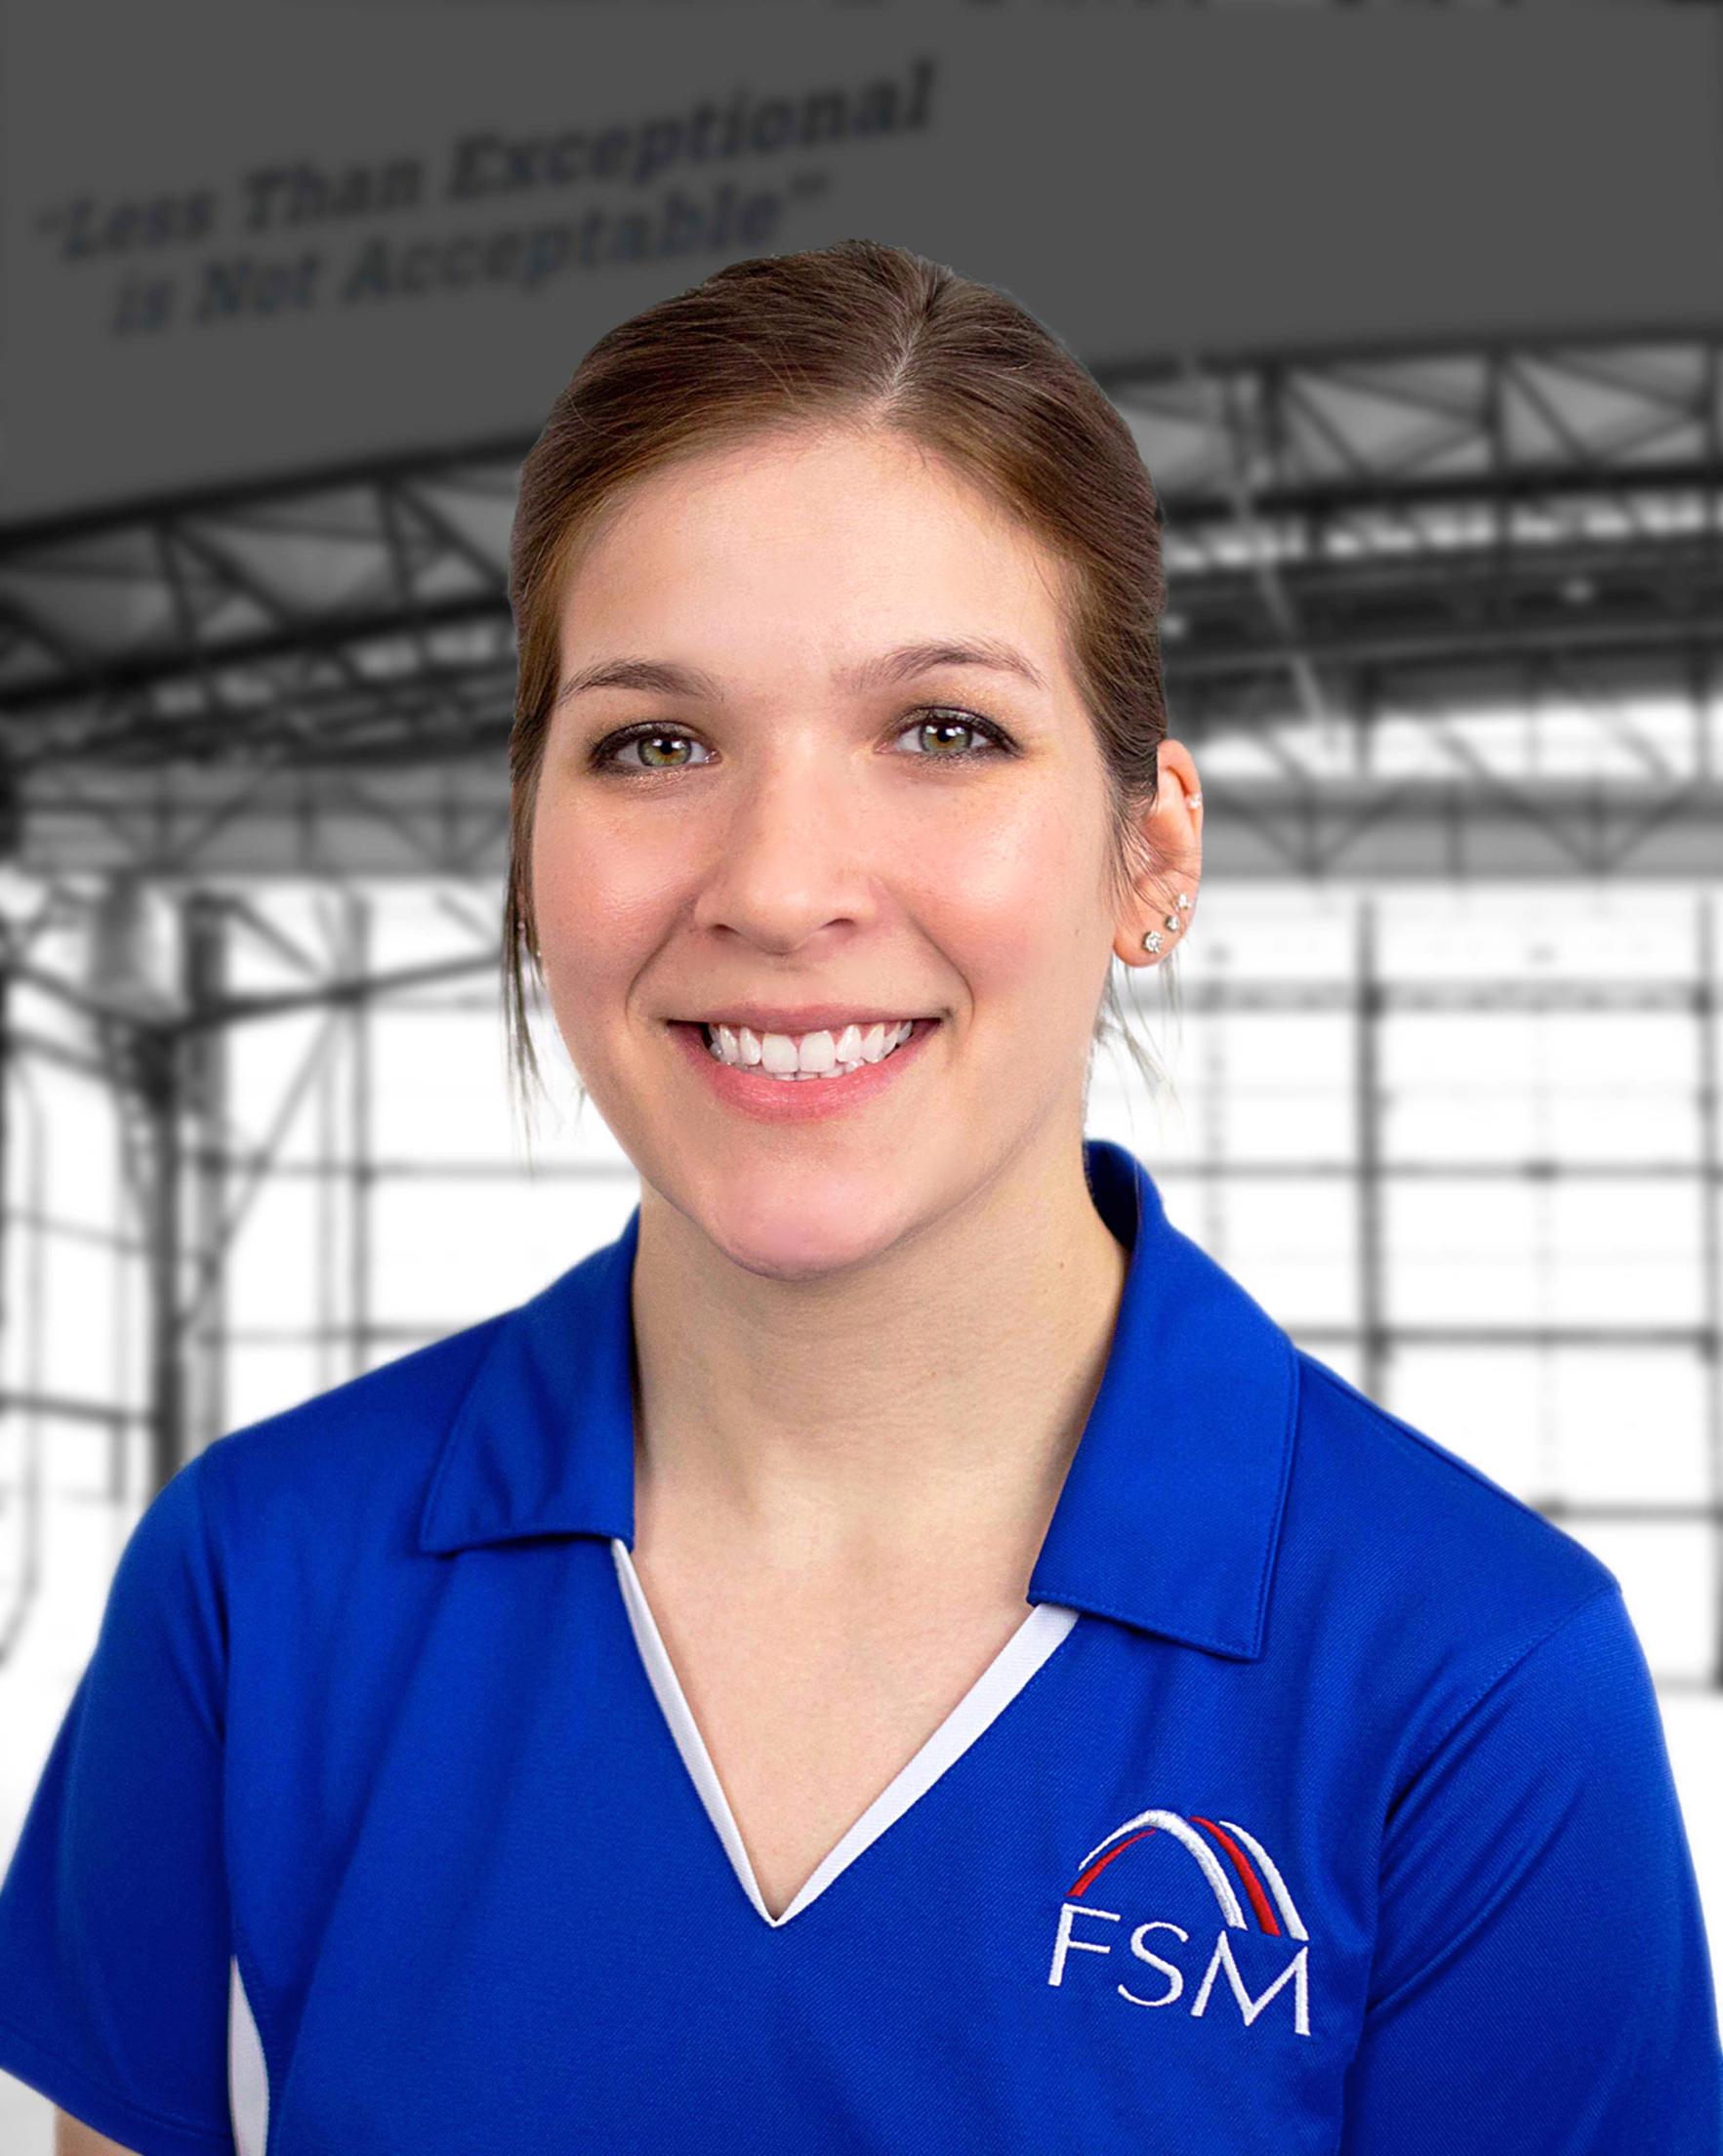 FSM Chelsea Nejman Service Coordinator